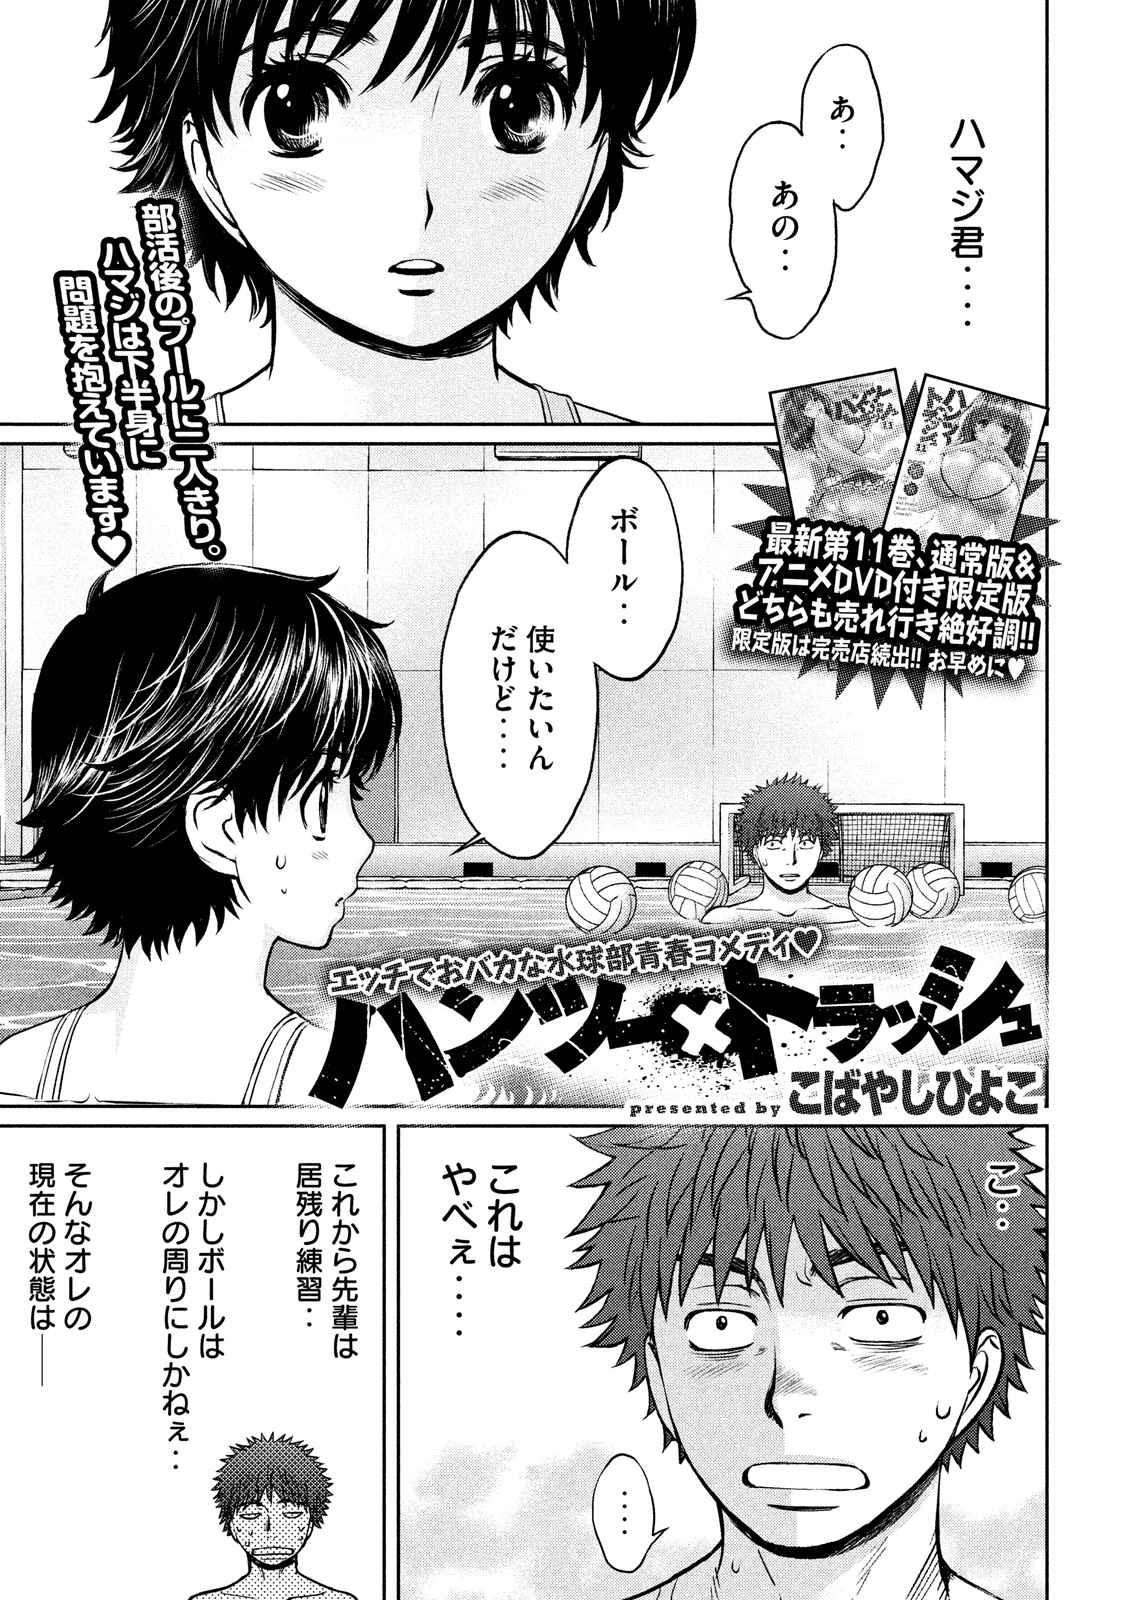 Hantsu x Trash - Chapter 136 - Page 1